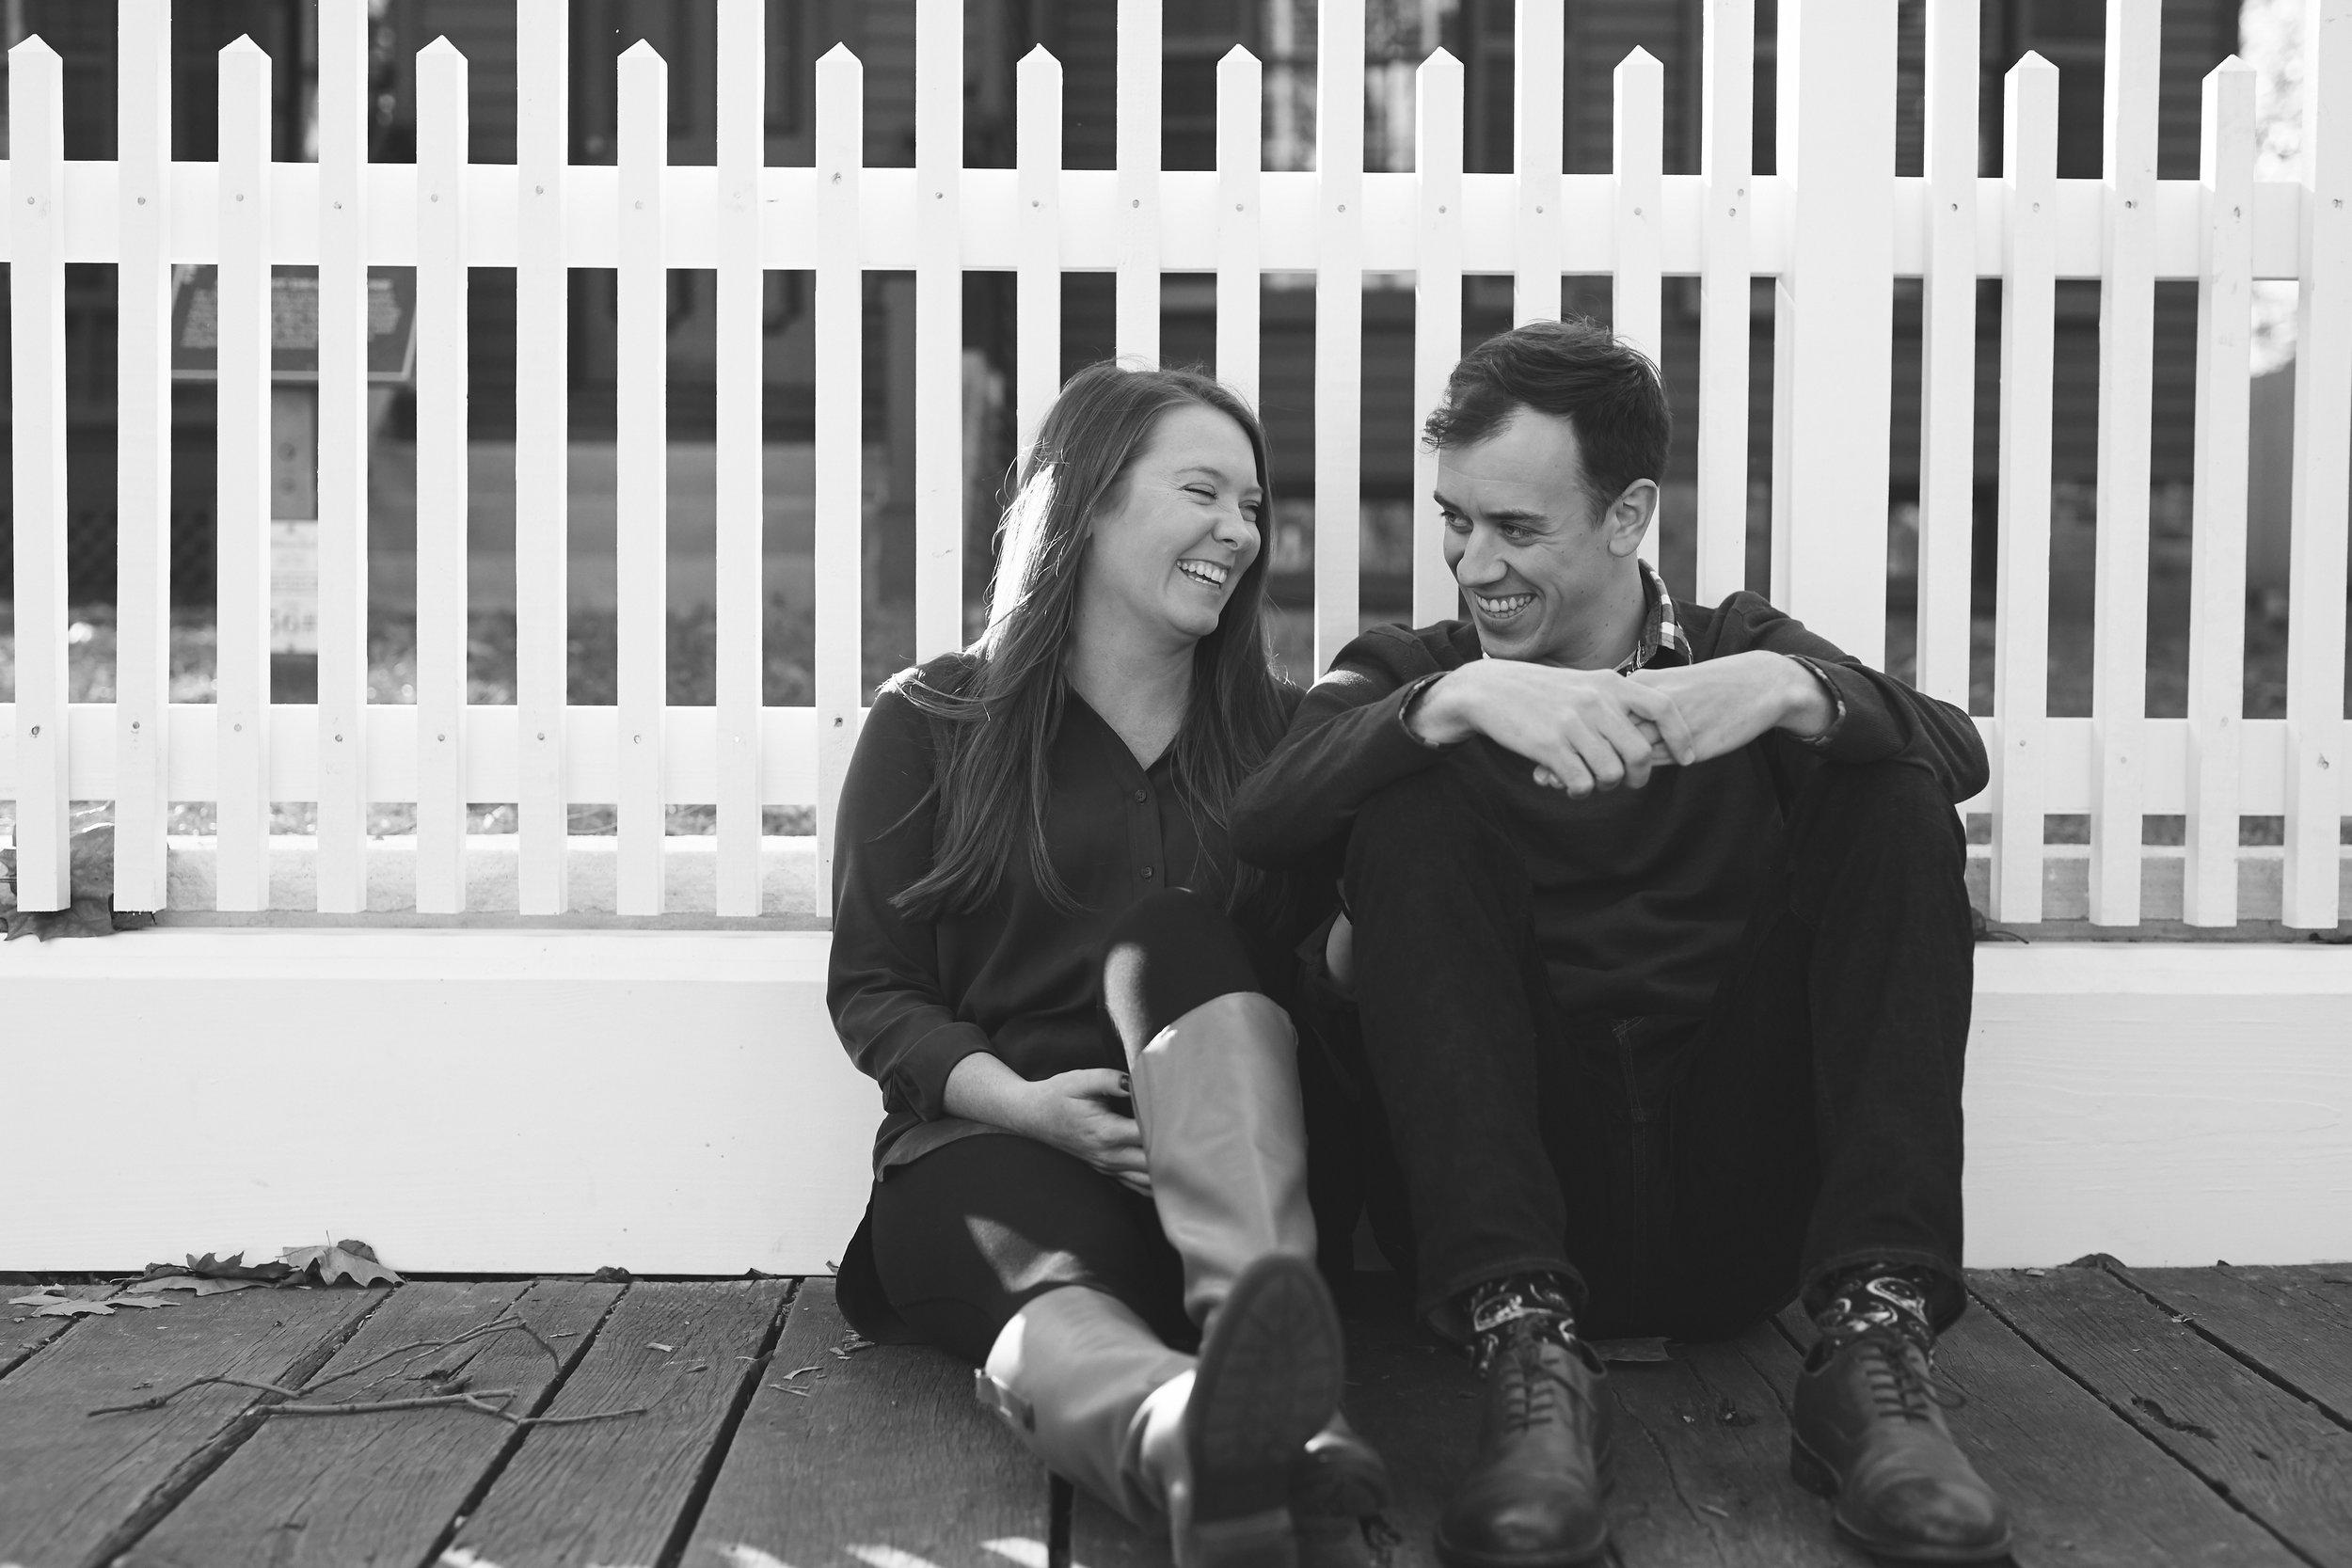 Troy & Kathleen - benromangphoto - 6I5A0361.jpg